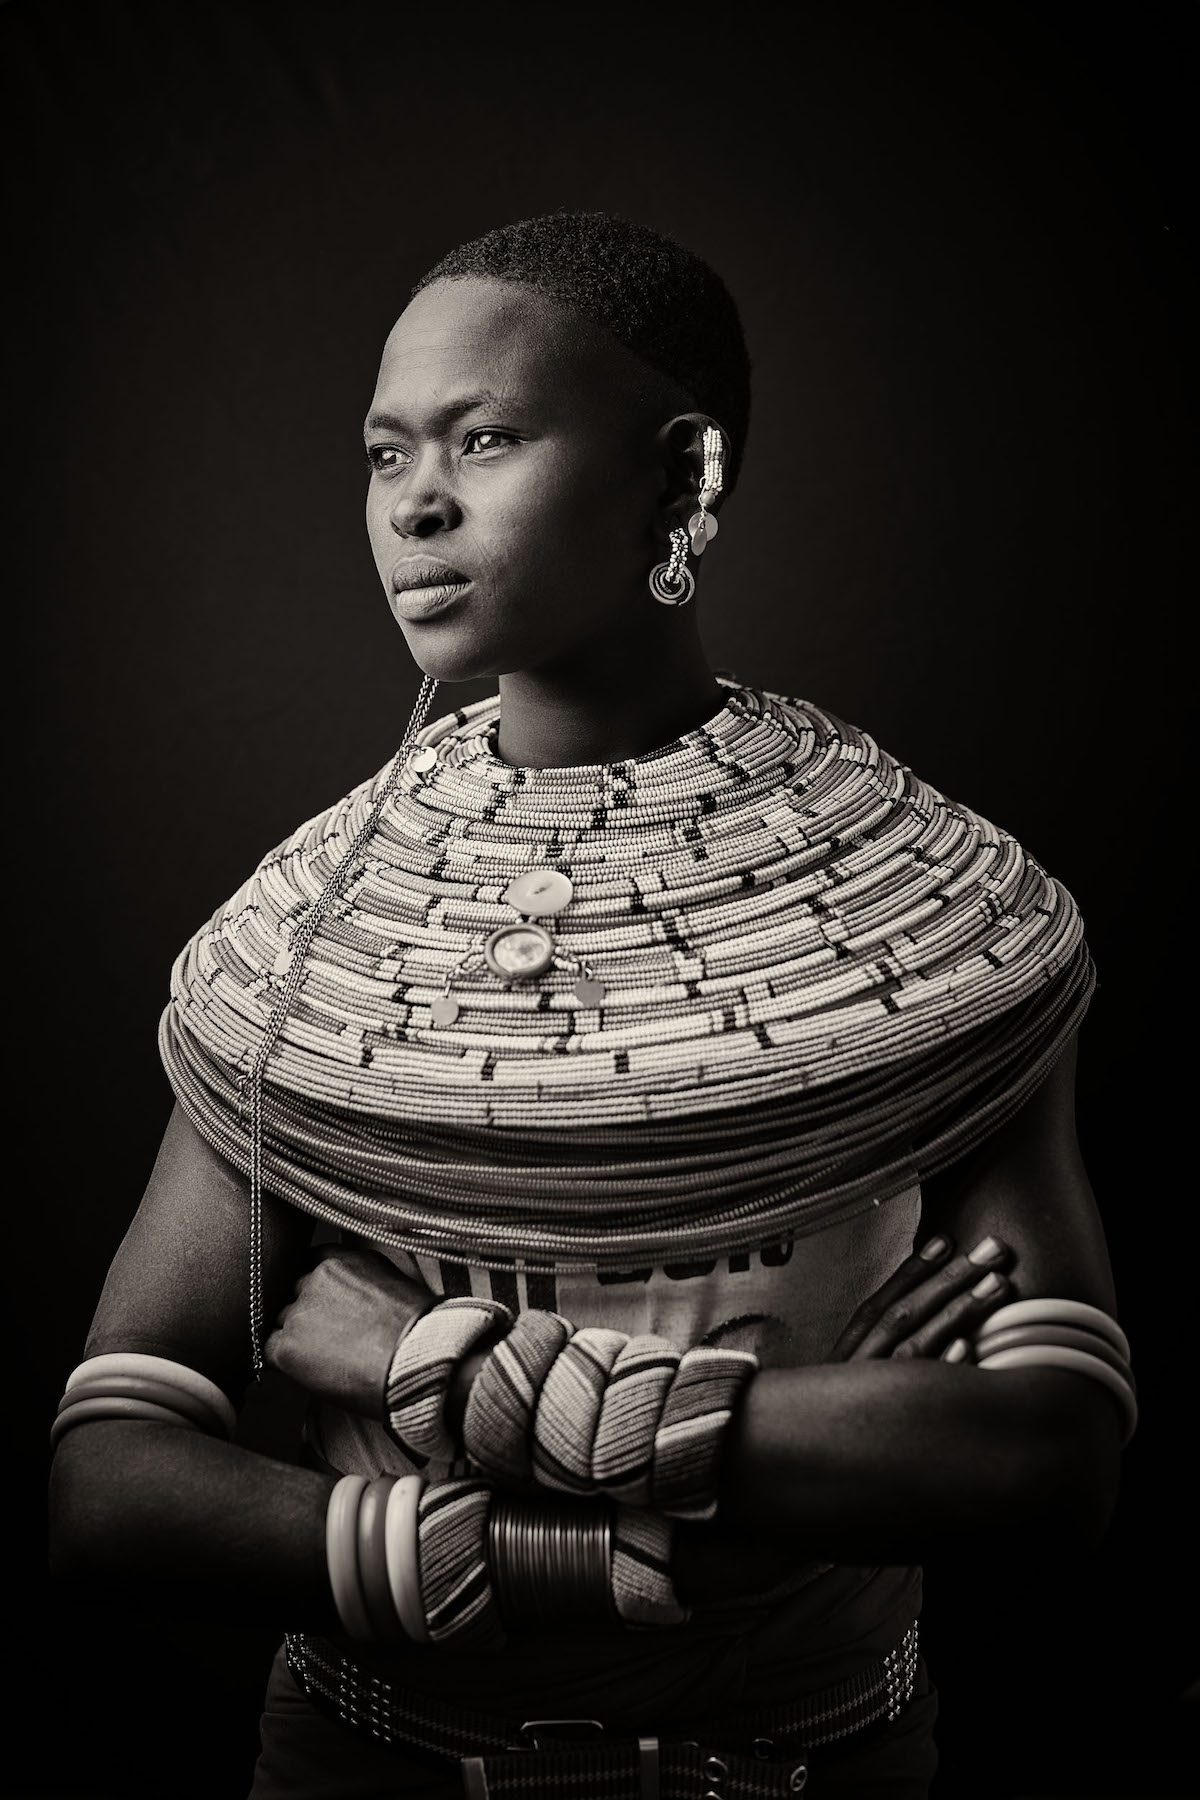 HugoSantarem Rodrigues Ancestry Photography